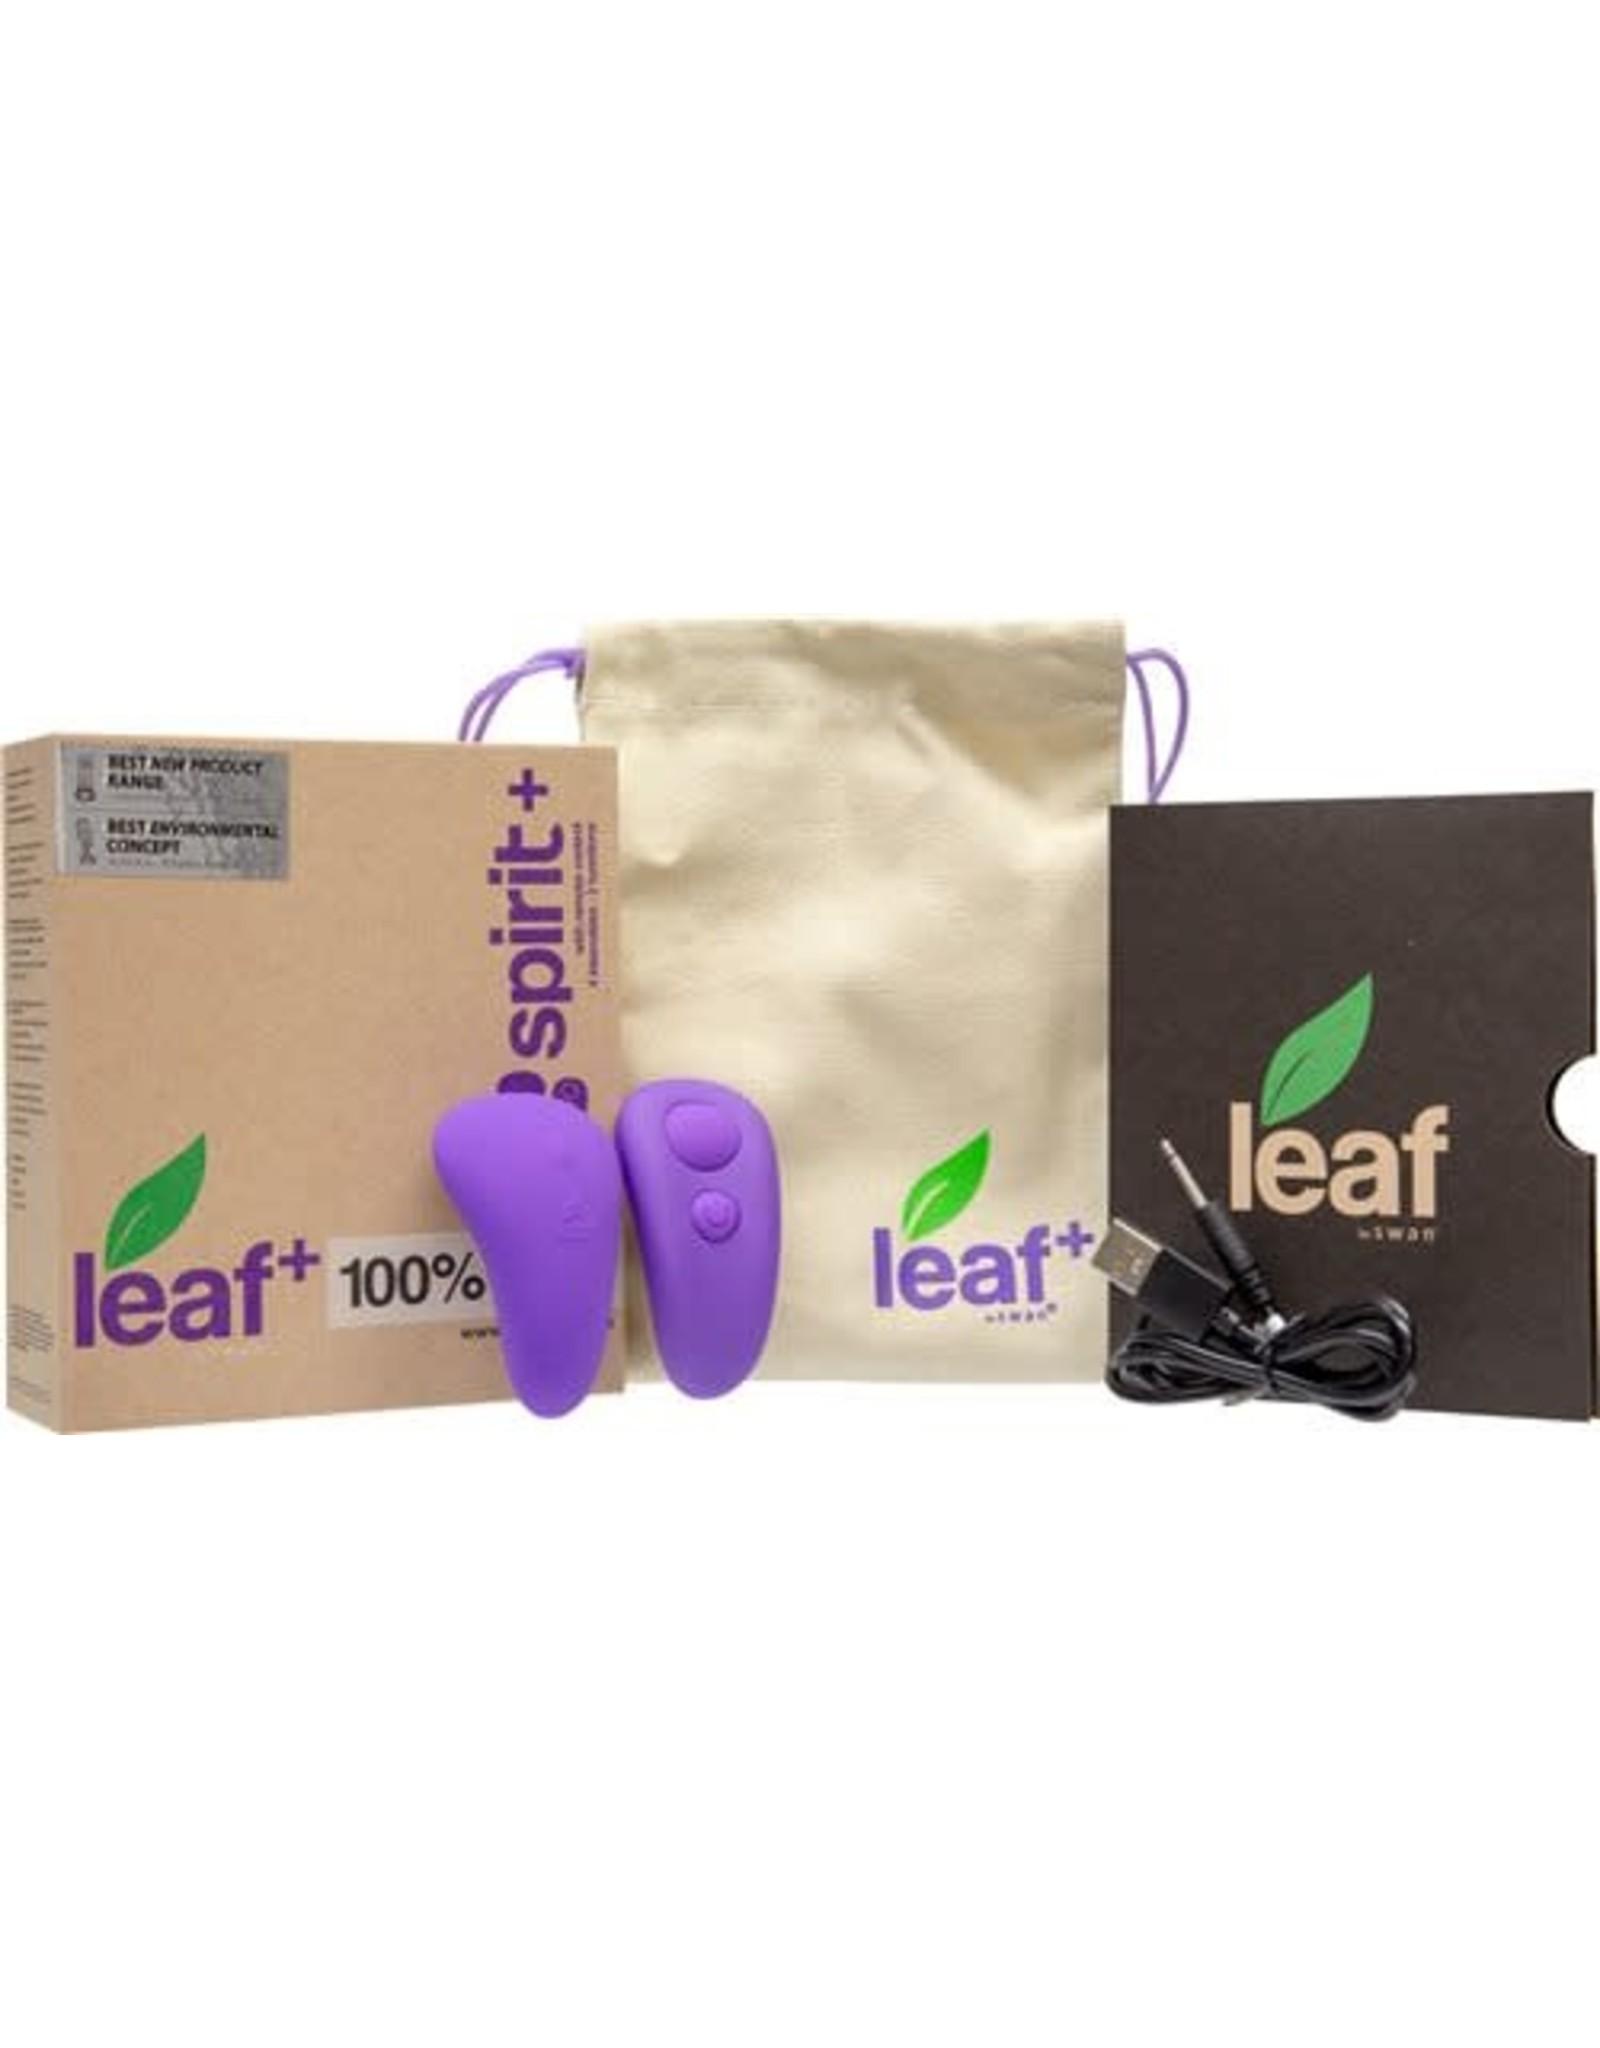 Leaf Spirit Plus Panty Vibe with Remote